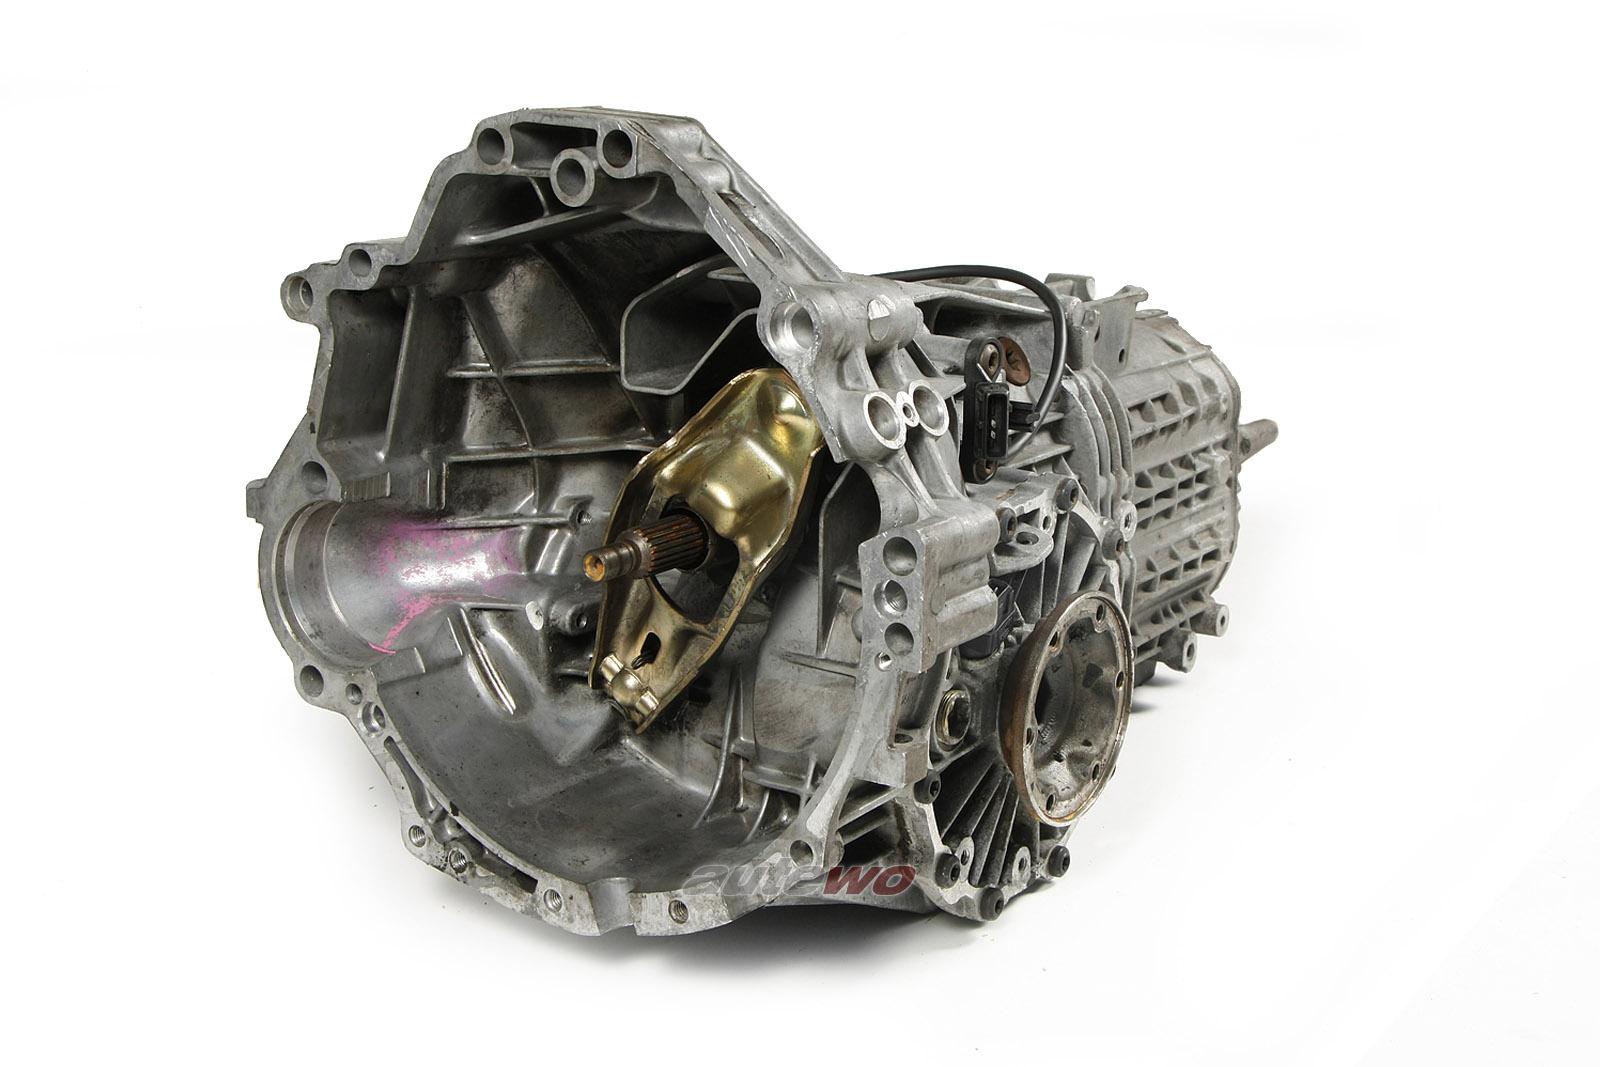 012300053CX Audi/VW 80 Typ 89 Cabrio/A4 B5/A6 C4 1.8l Schaltgetriebe DHZ 29047